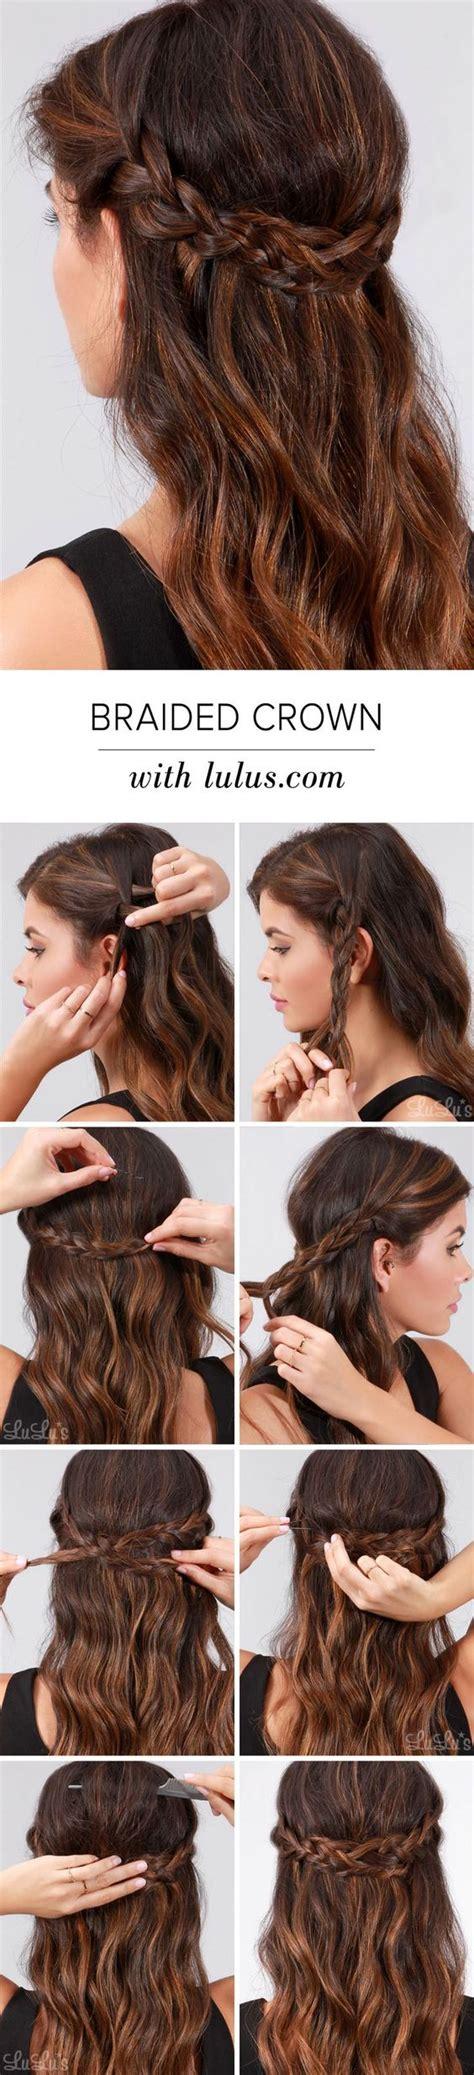 25 Pretty Bobby Pin Hairstyles